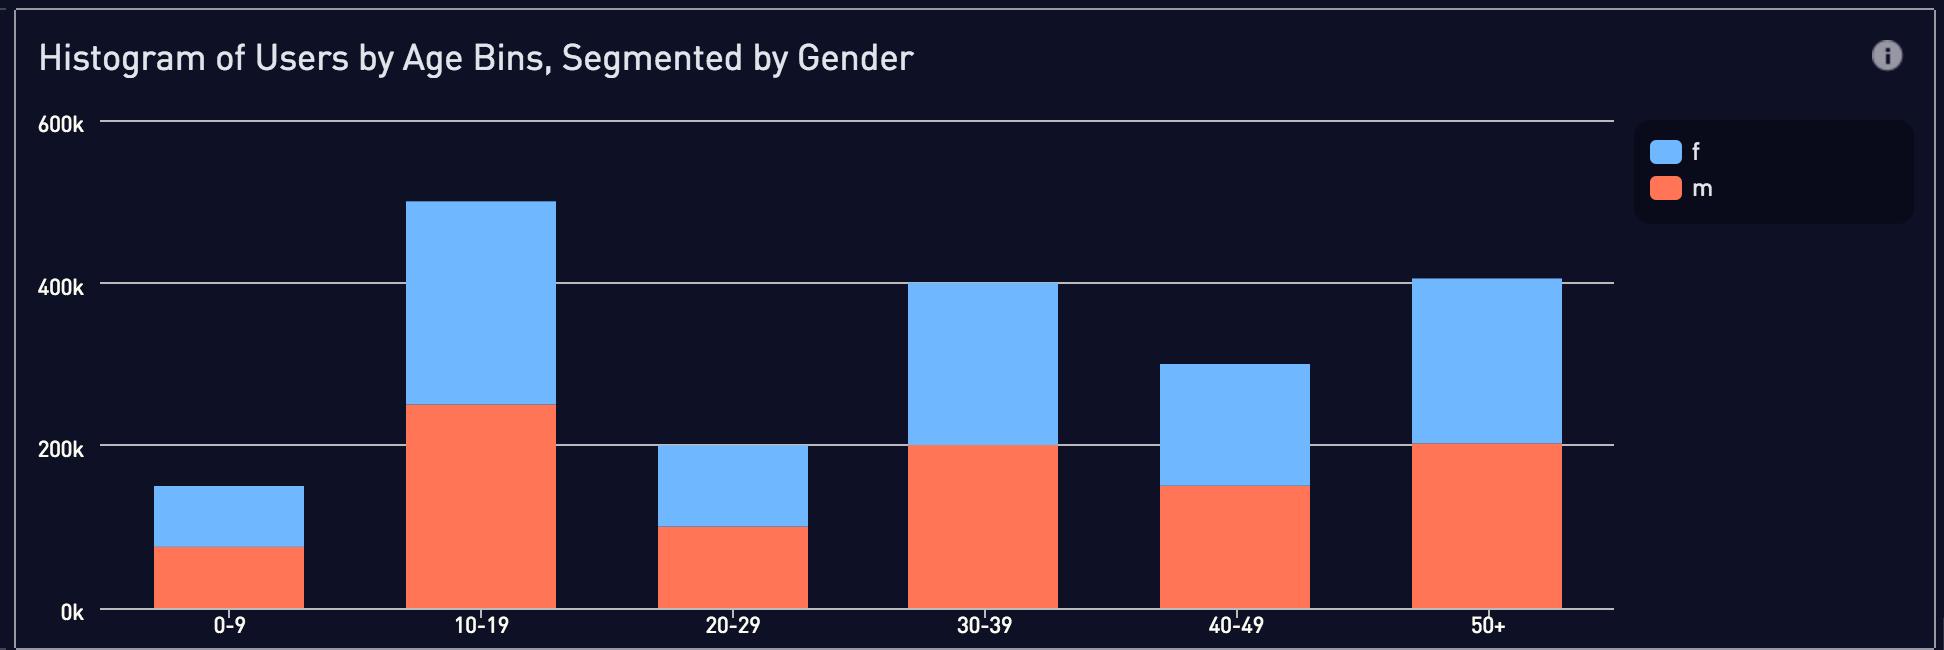 Segmented by gender